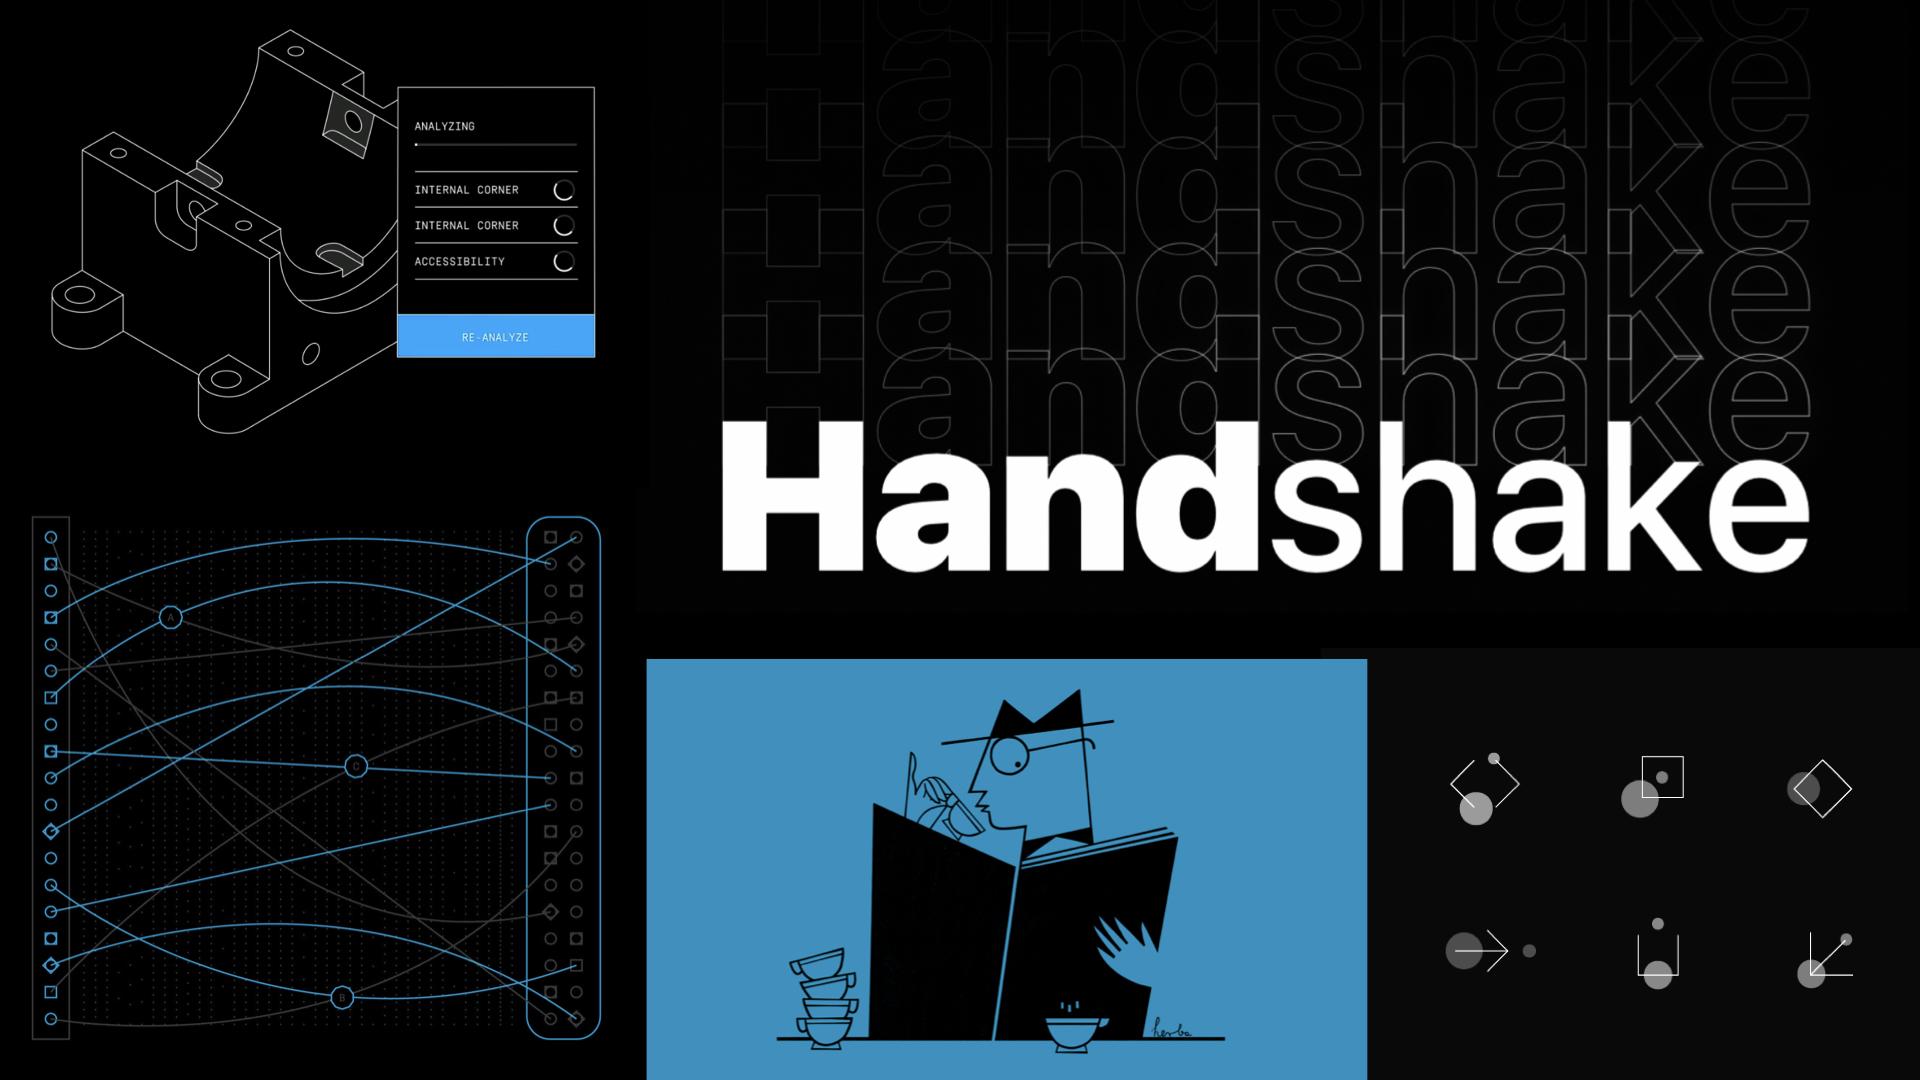 Harness_Moodboard_r1v2_jh.004